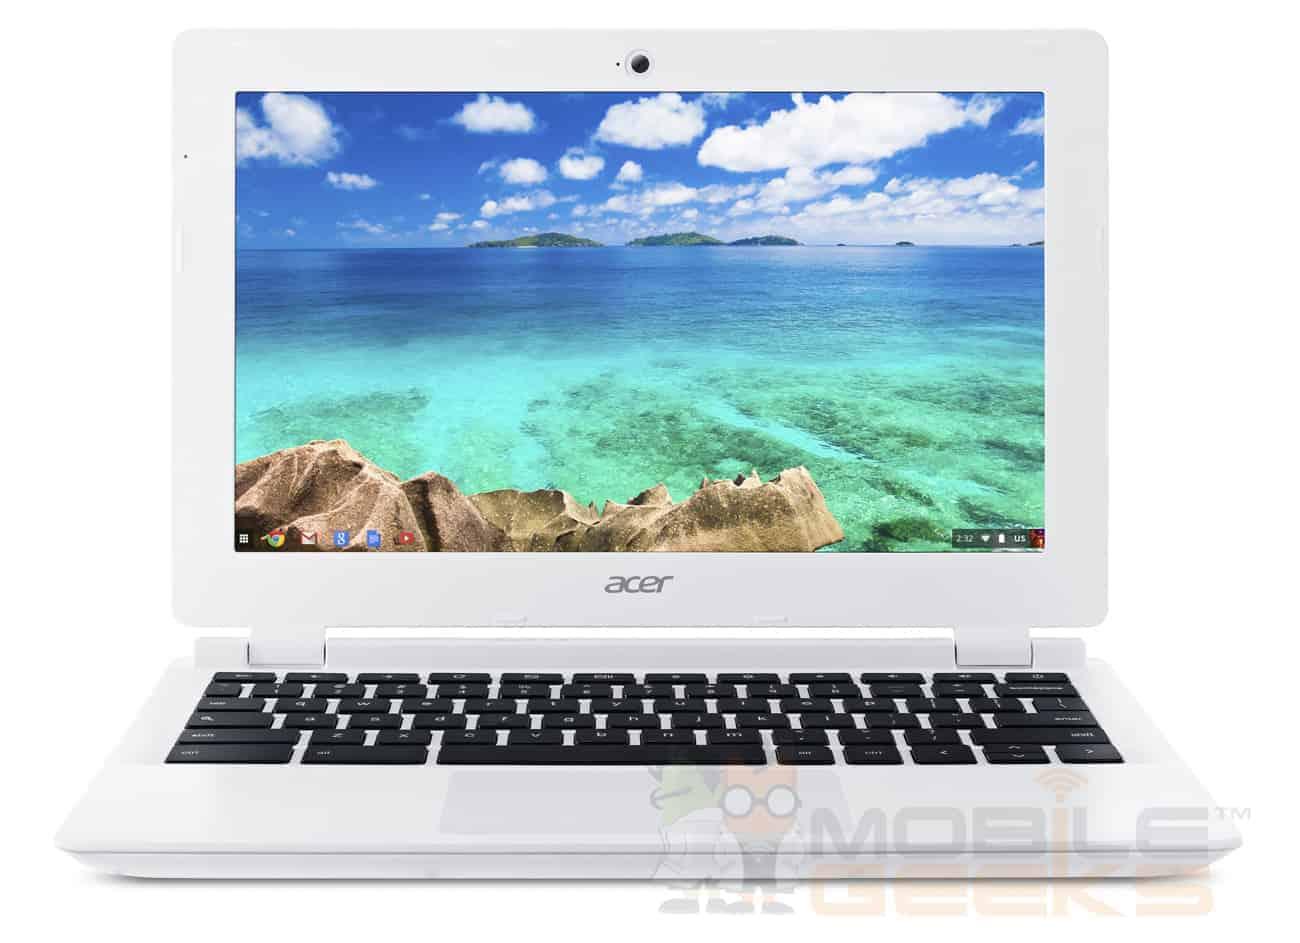 Acer Chromebook CB3 Acer Chromebook 11 3